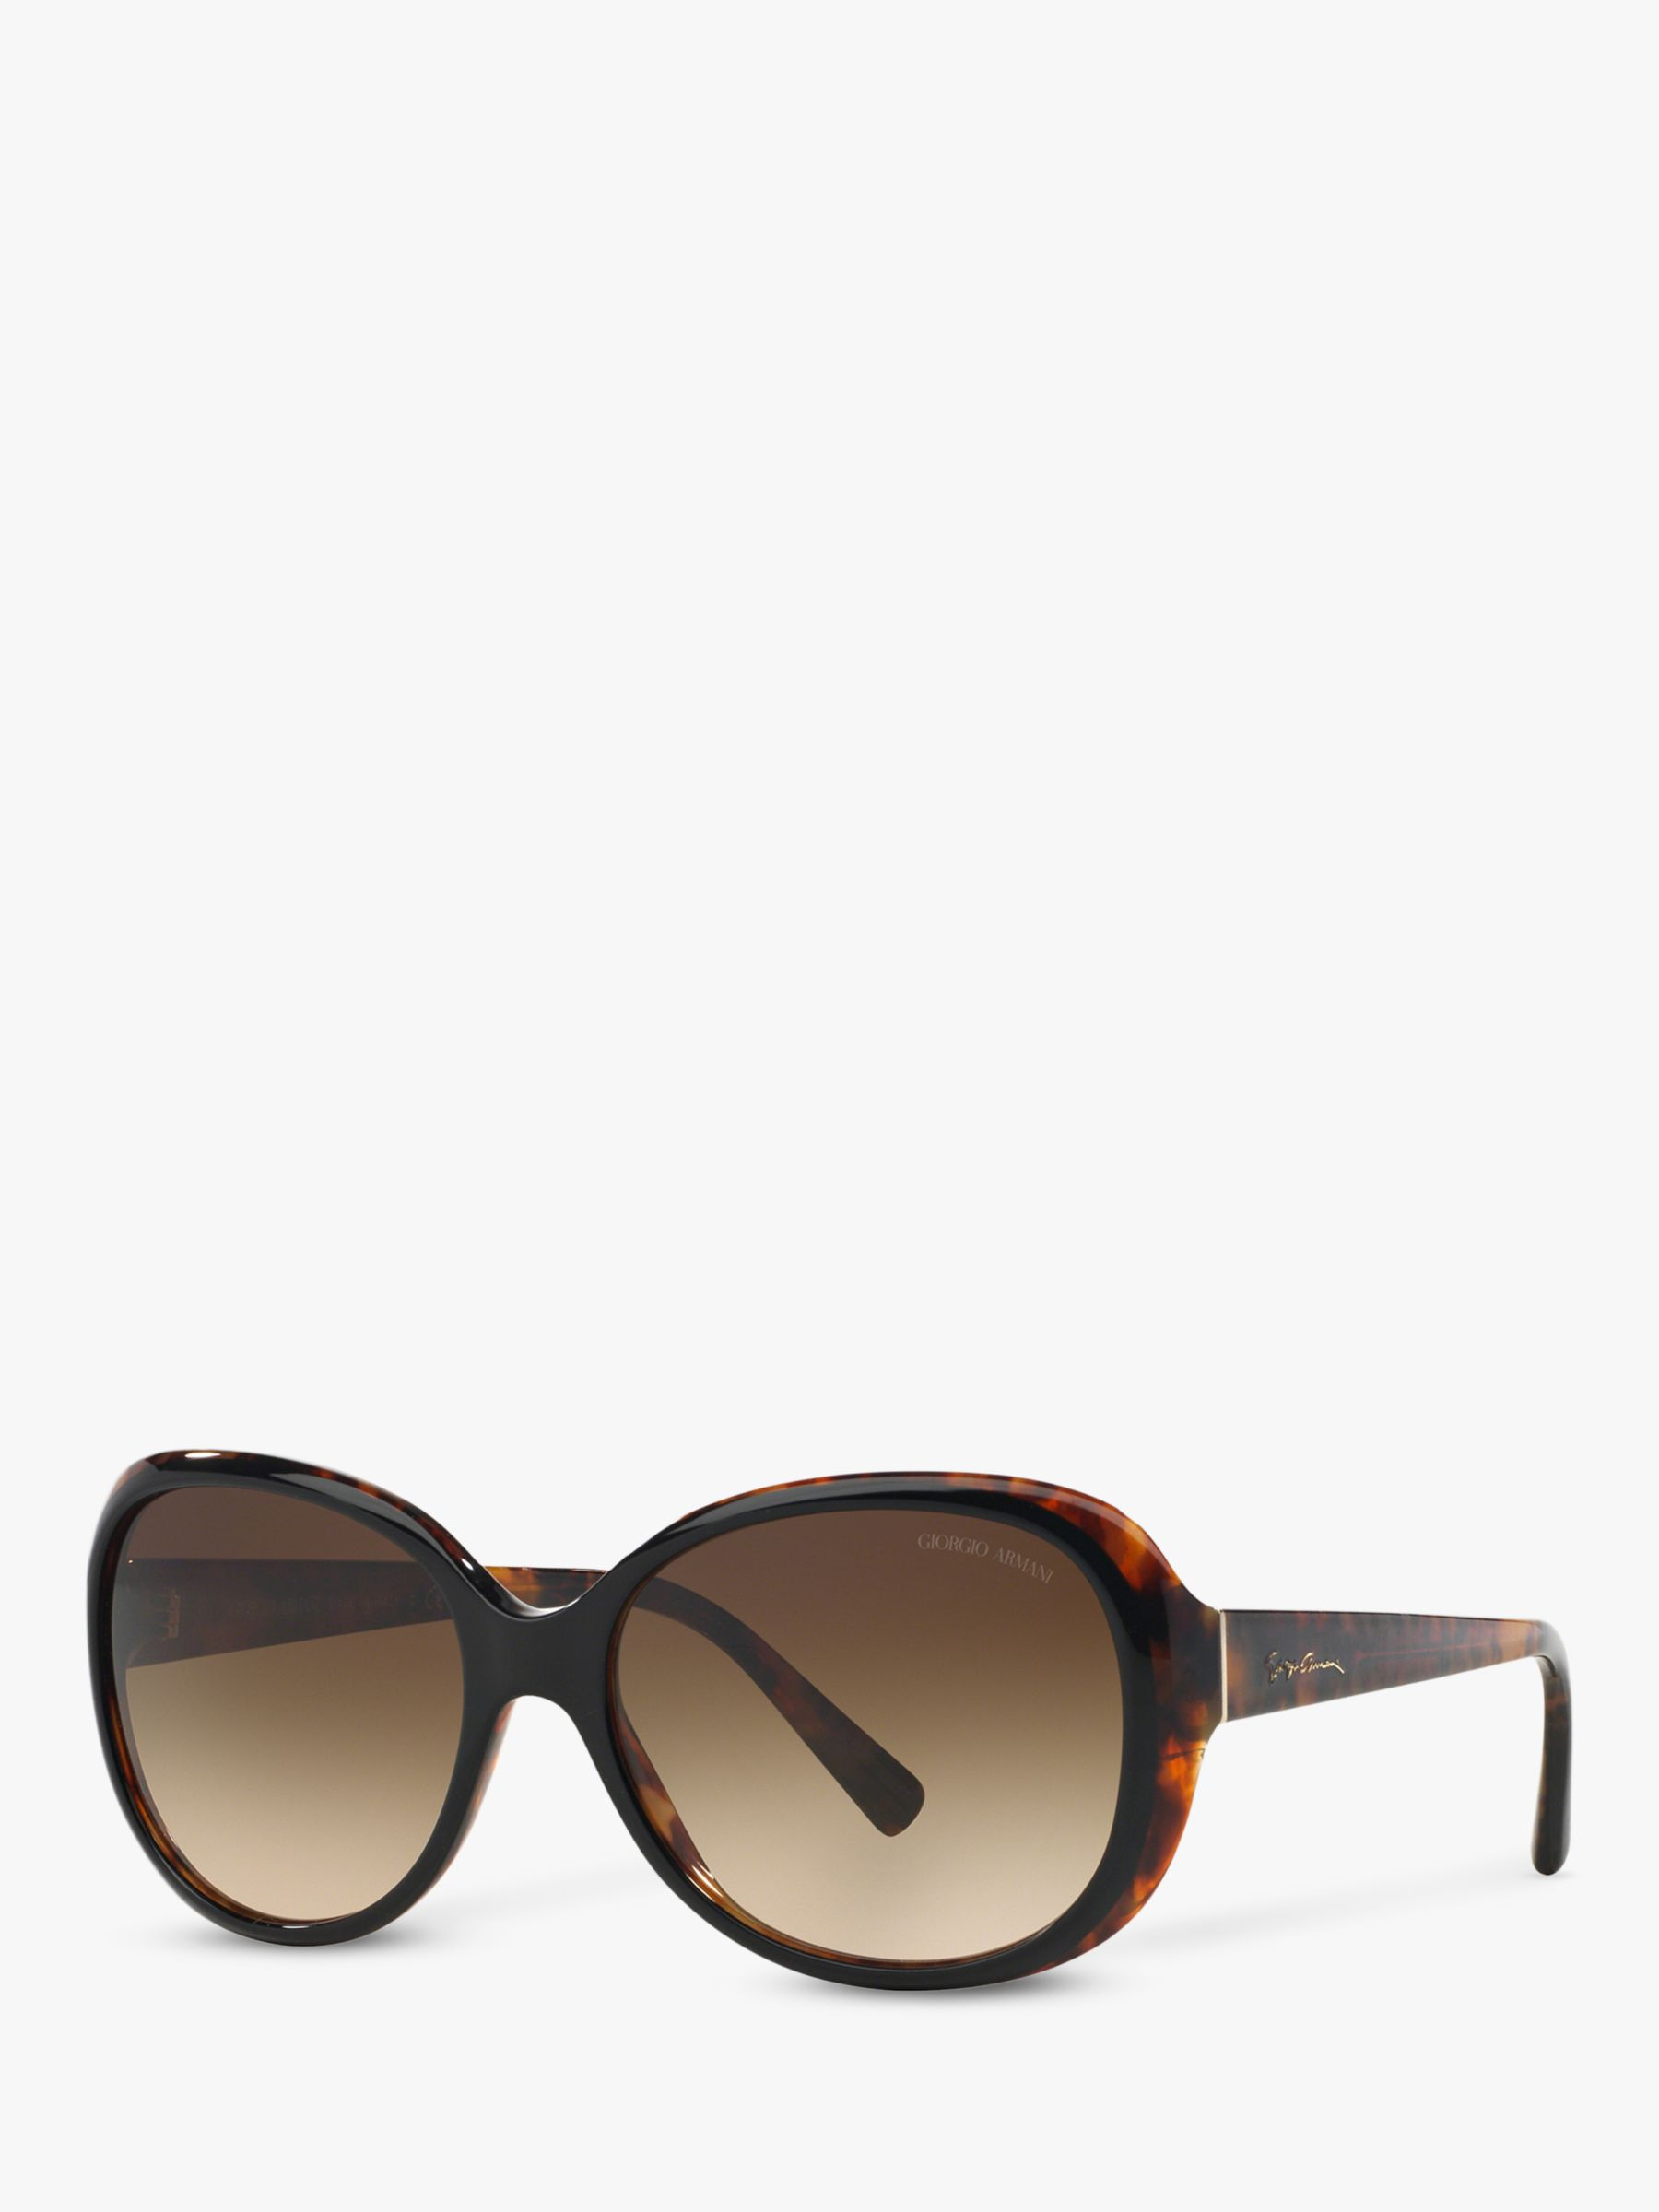 9591e38e74 Giorgio Armani AR8047 Women's Round Sunglasses, Black Havana